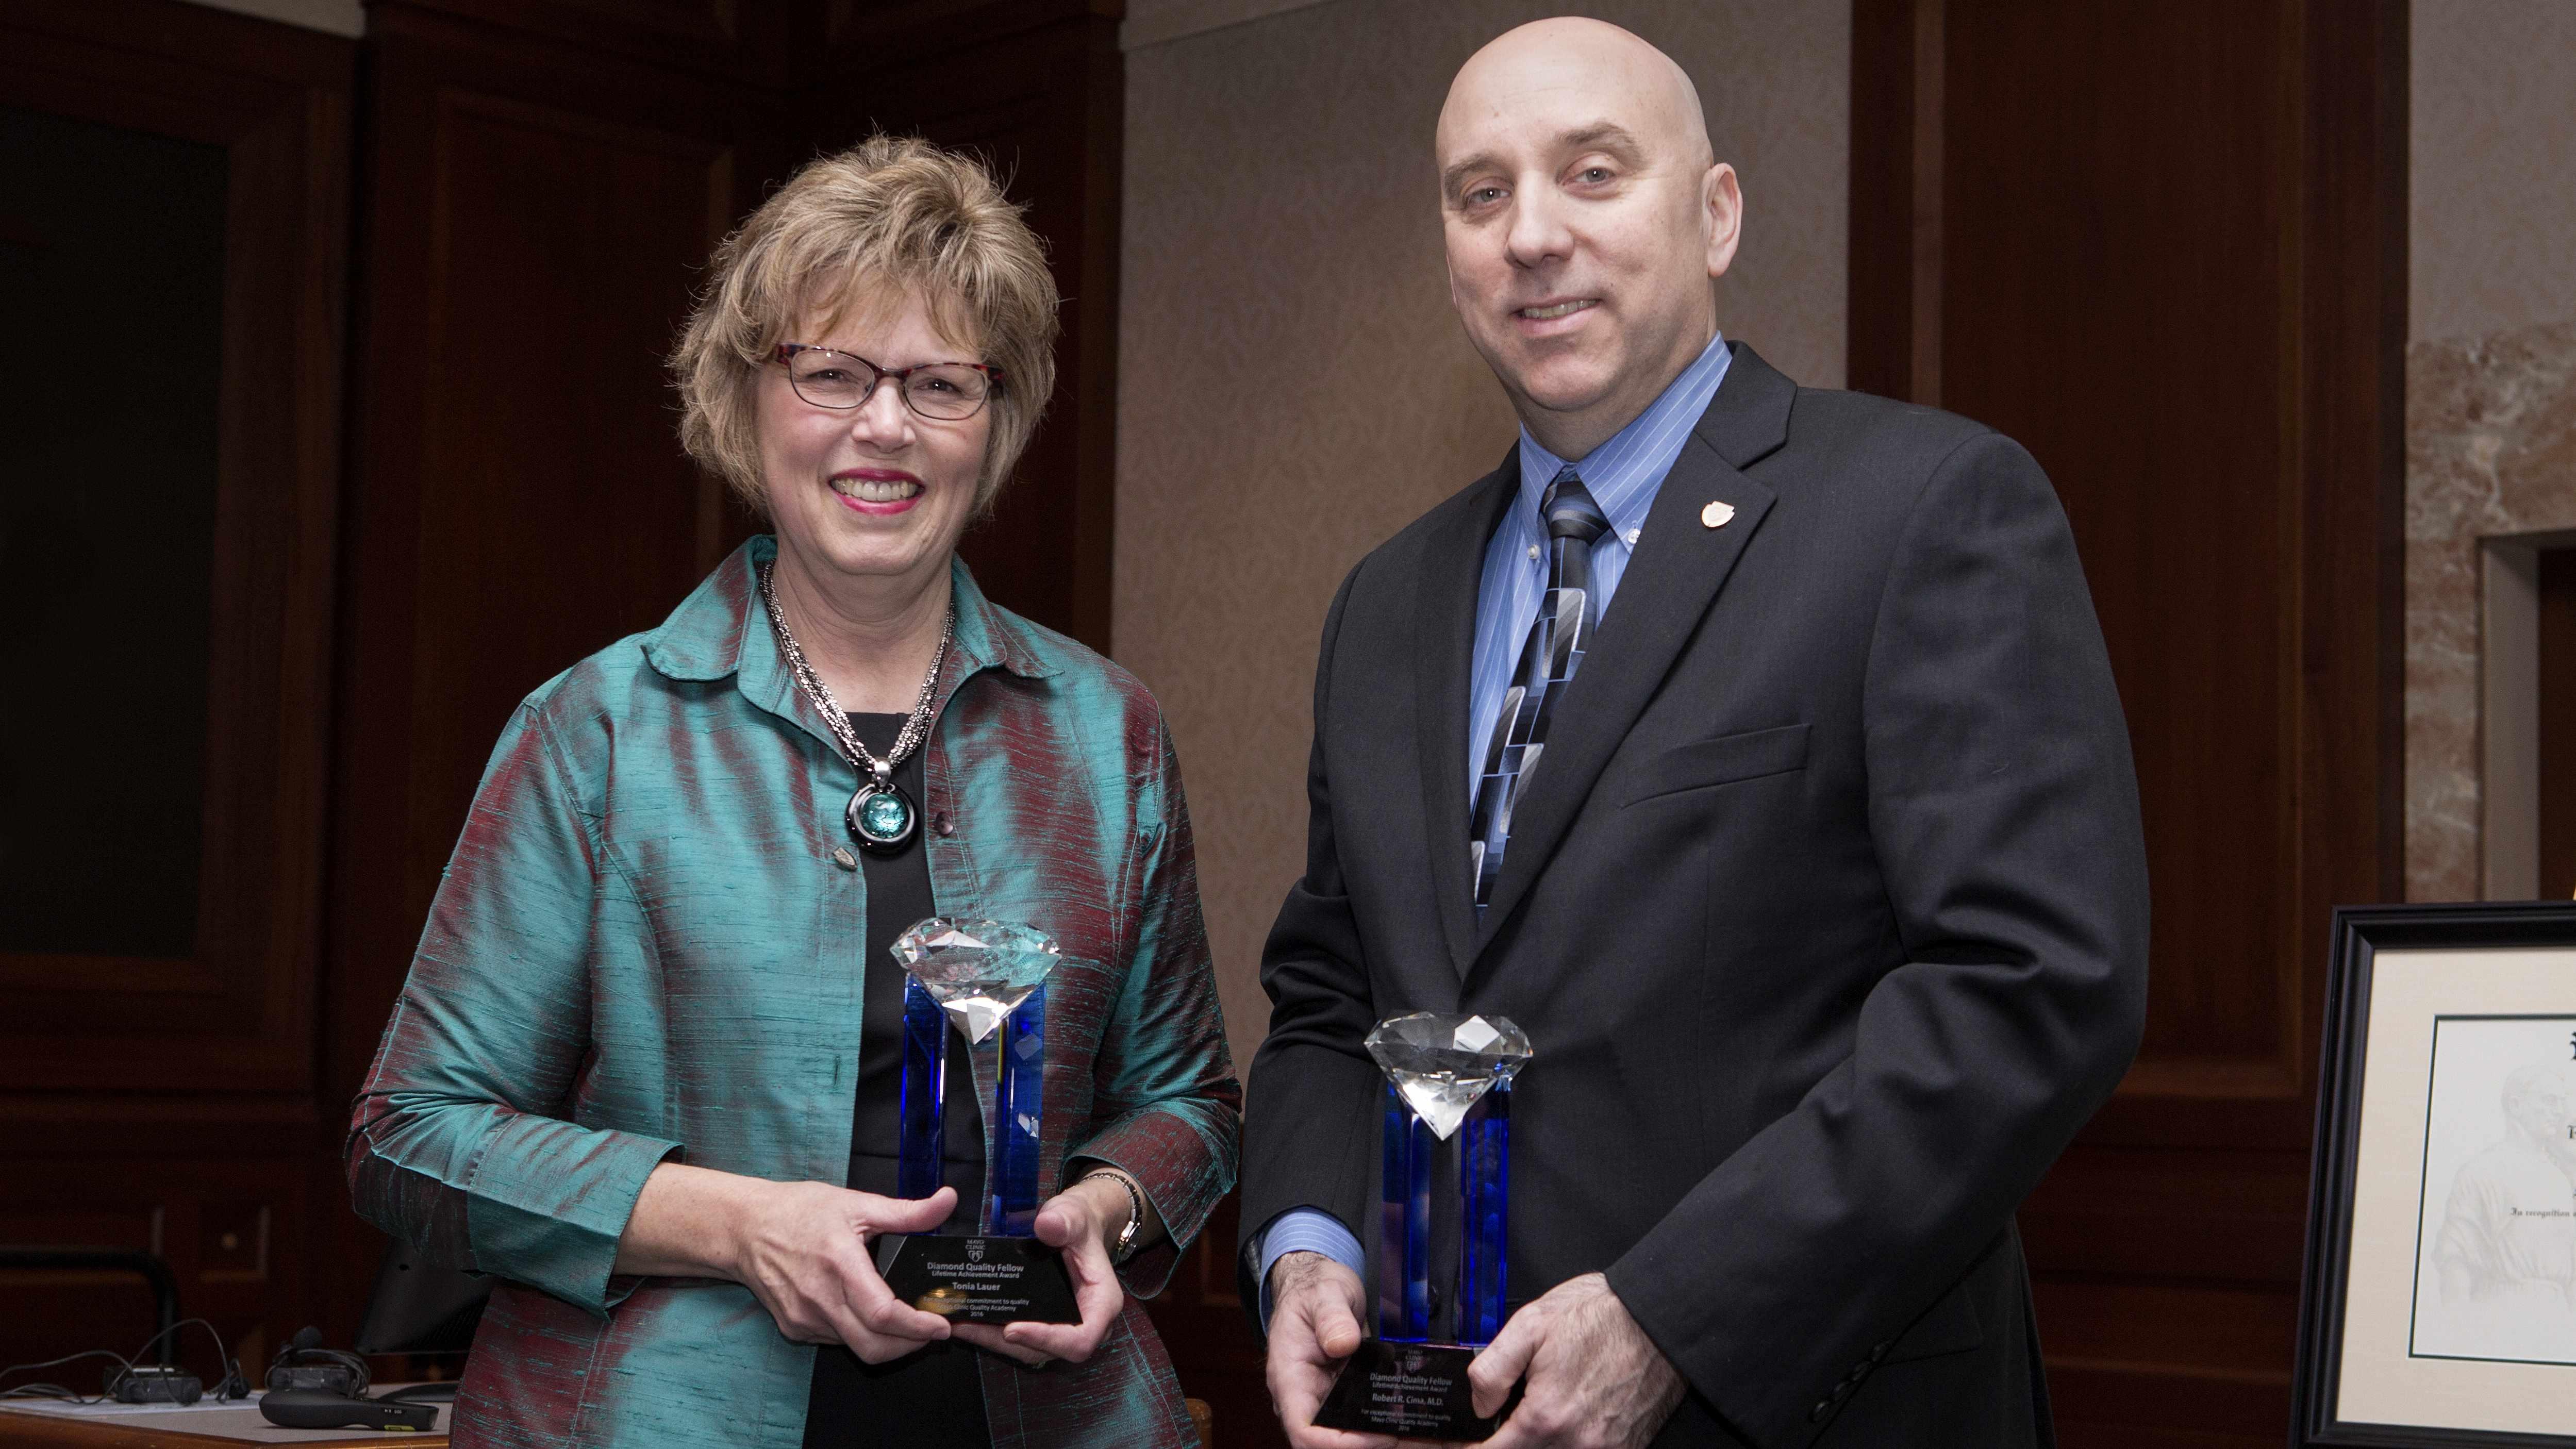 Diamond Quality Award Winners Tonia Lauer and Dr. Robert Cima